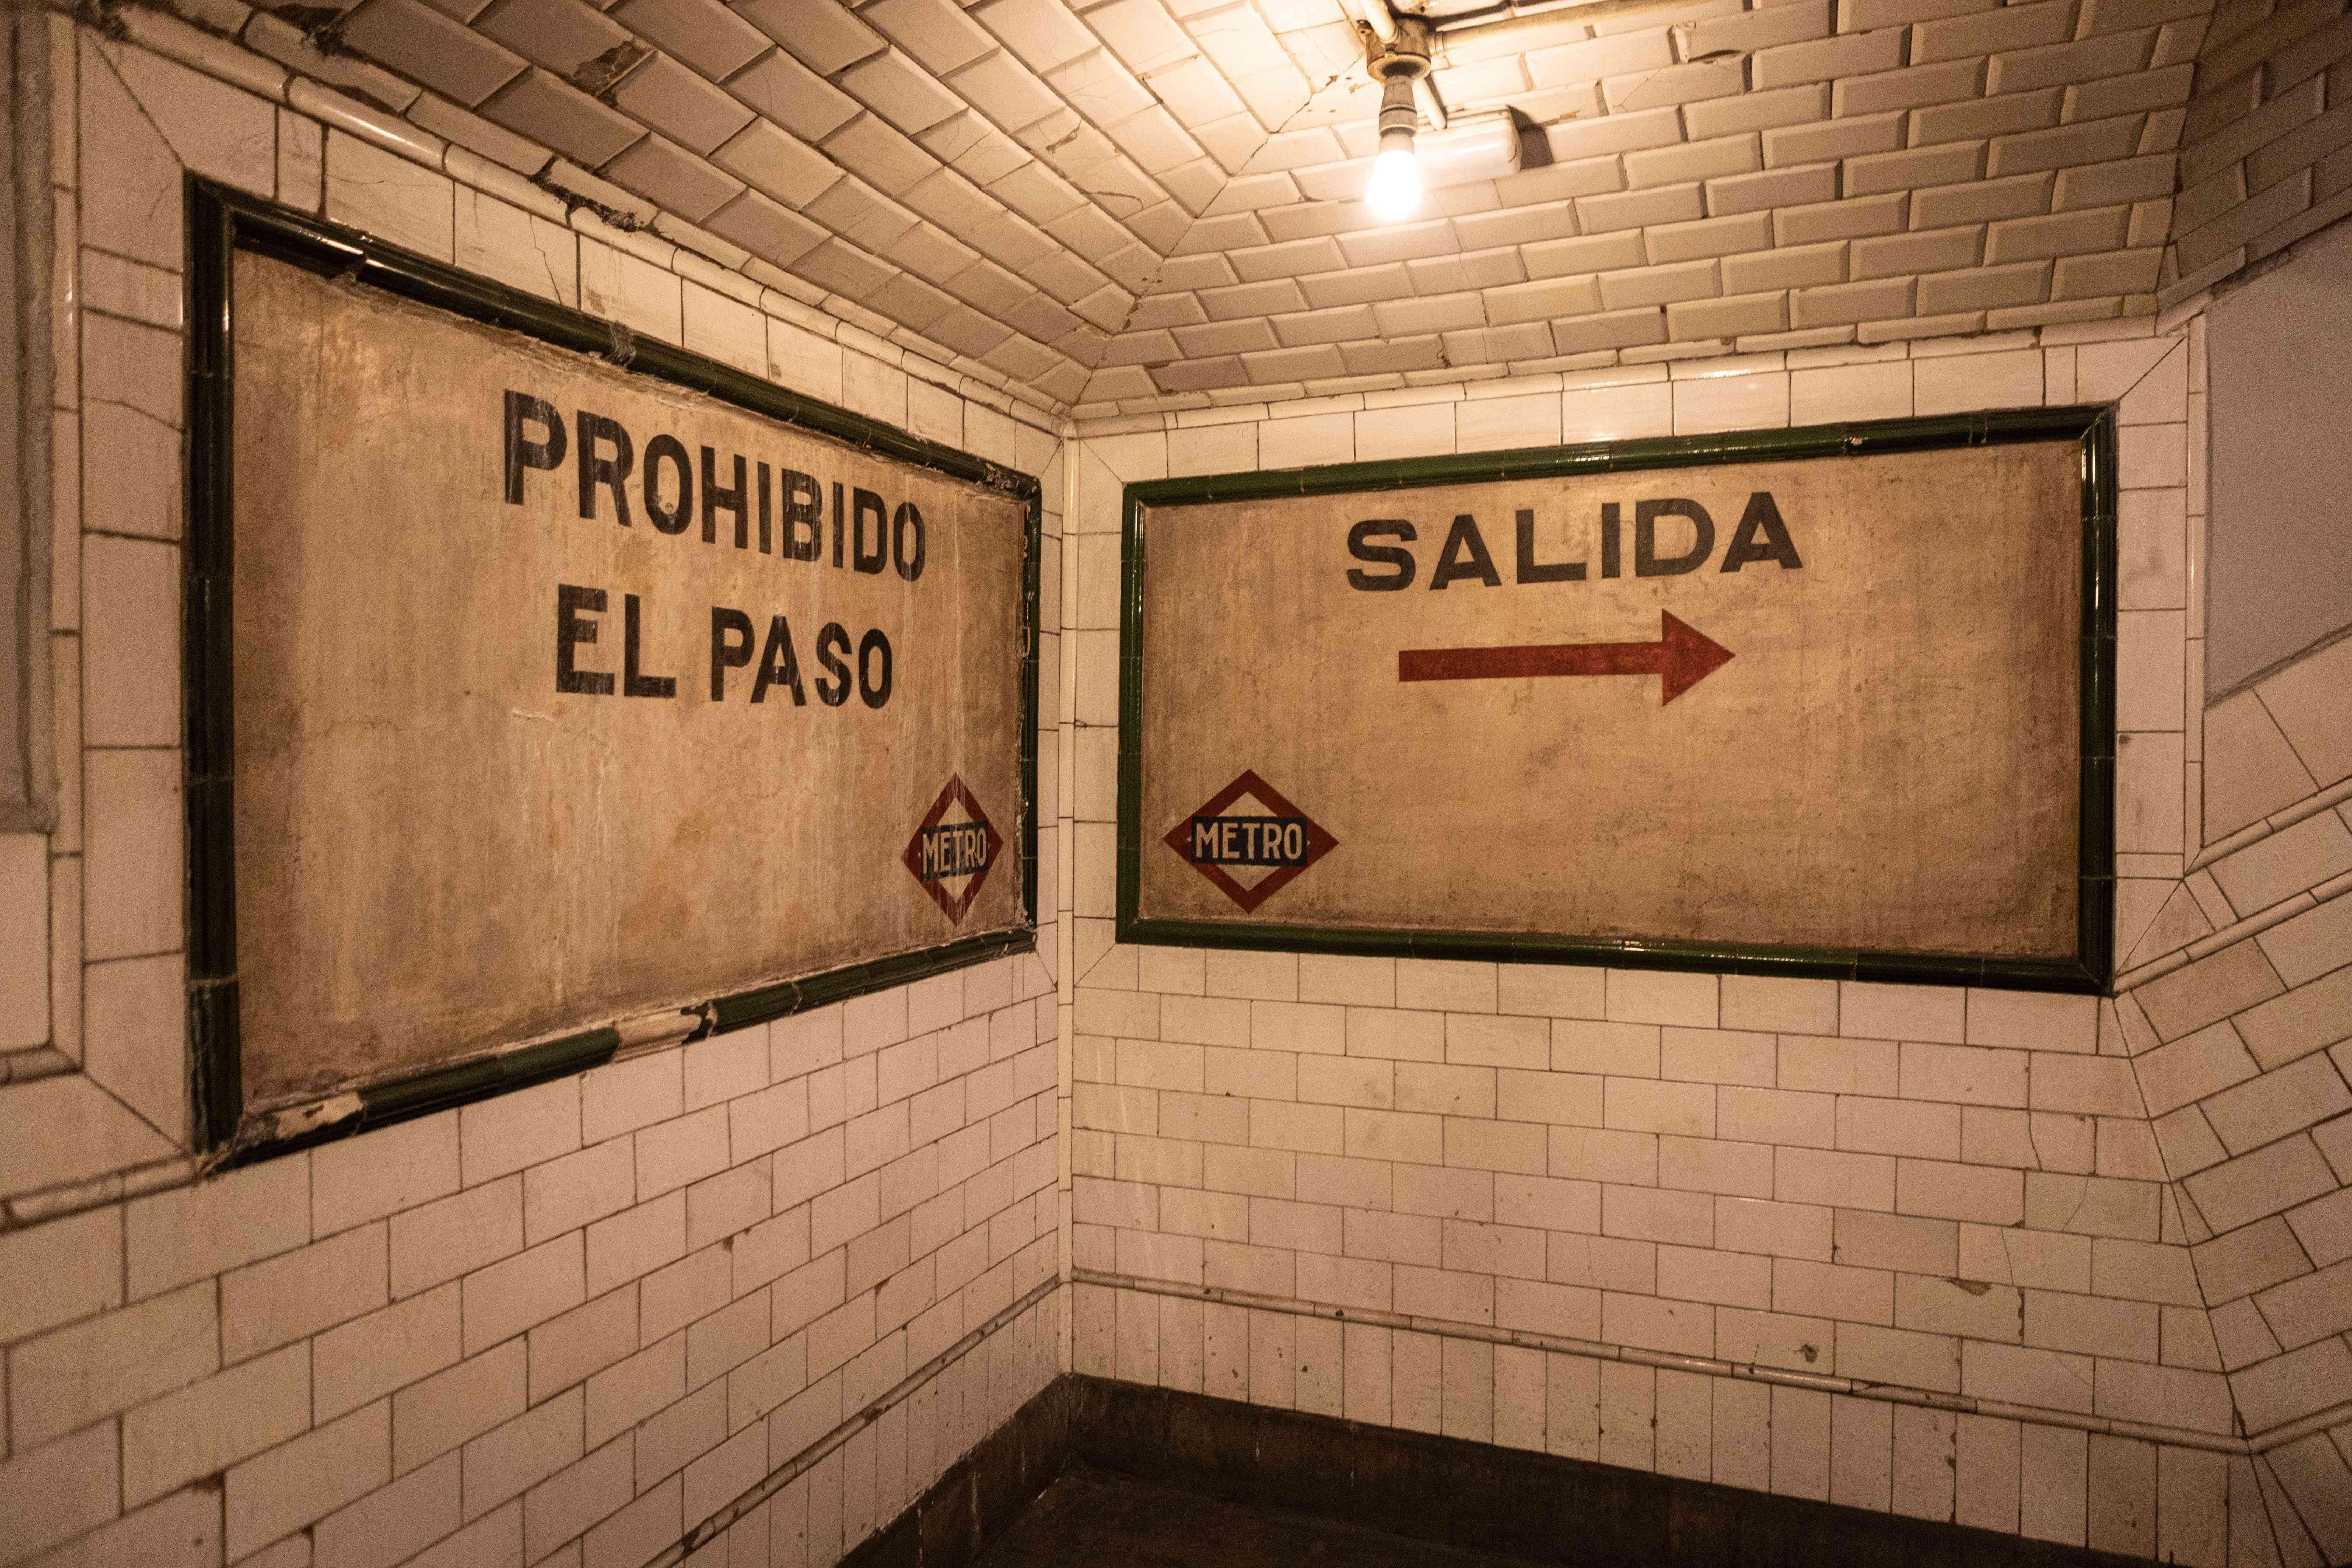 Metro Station Chamberí in Madrid, Spain